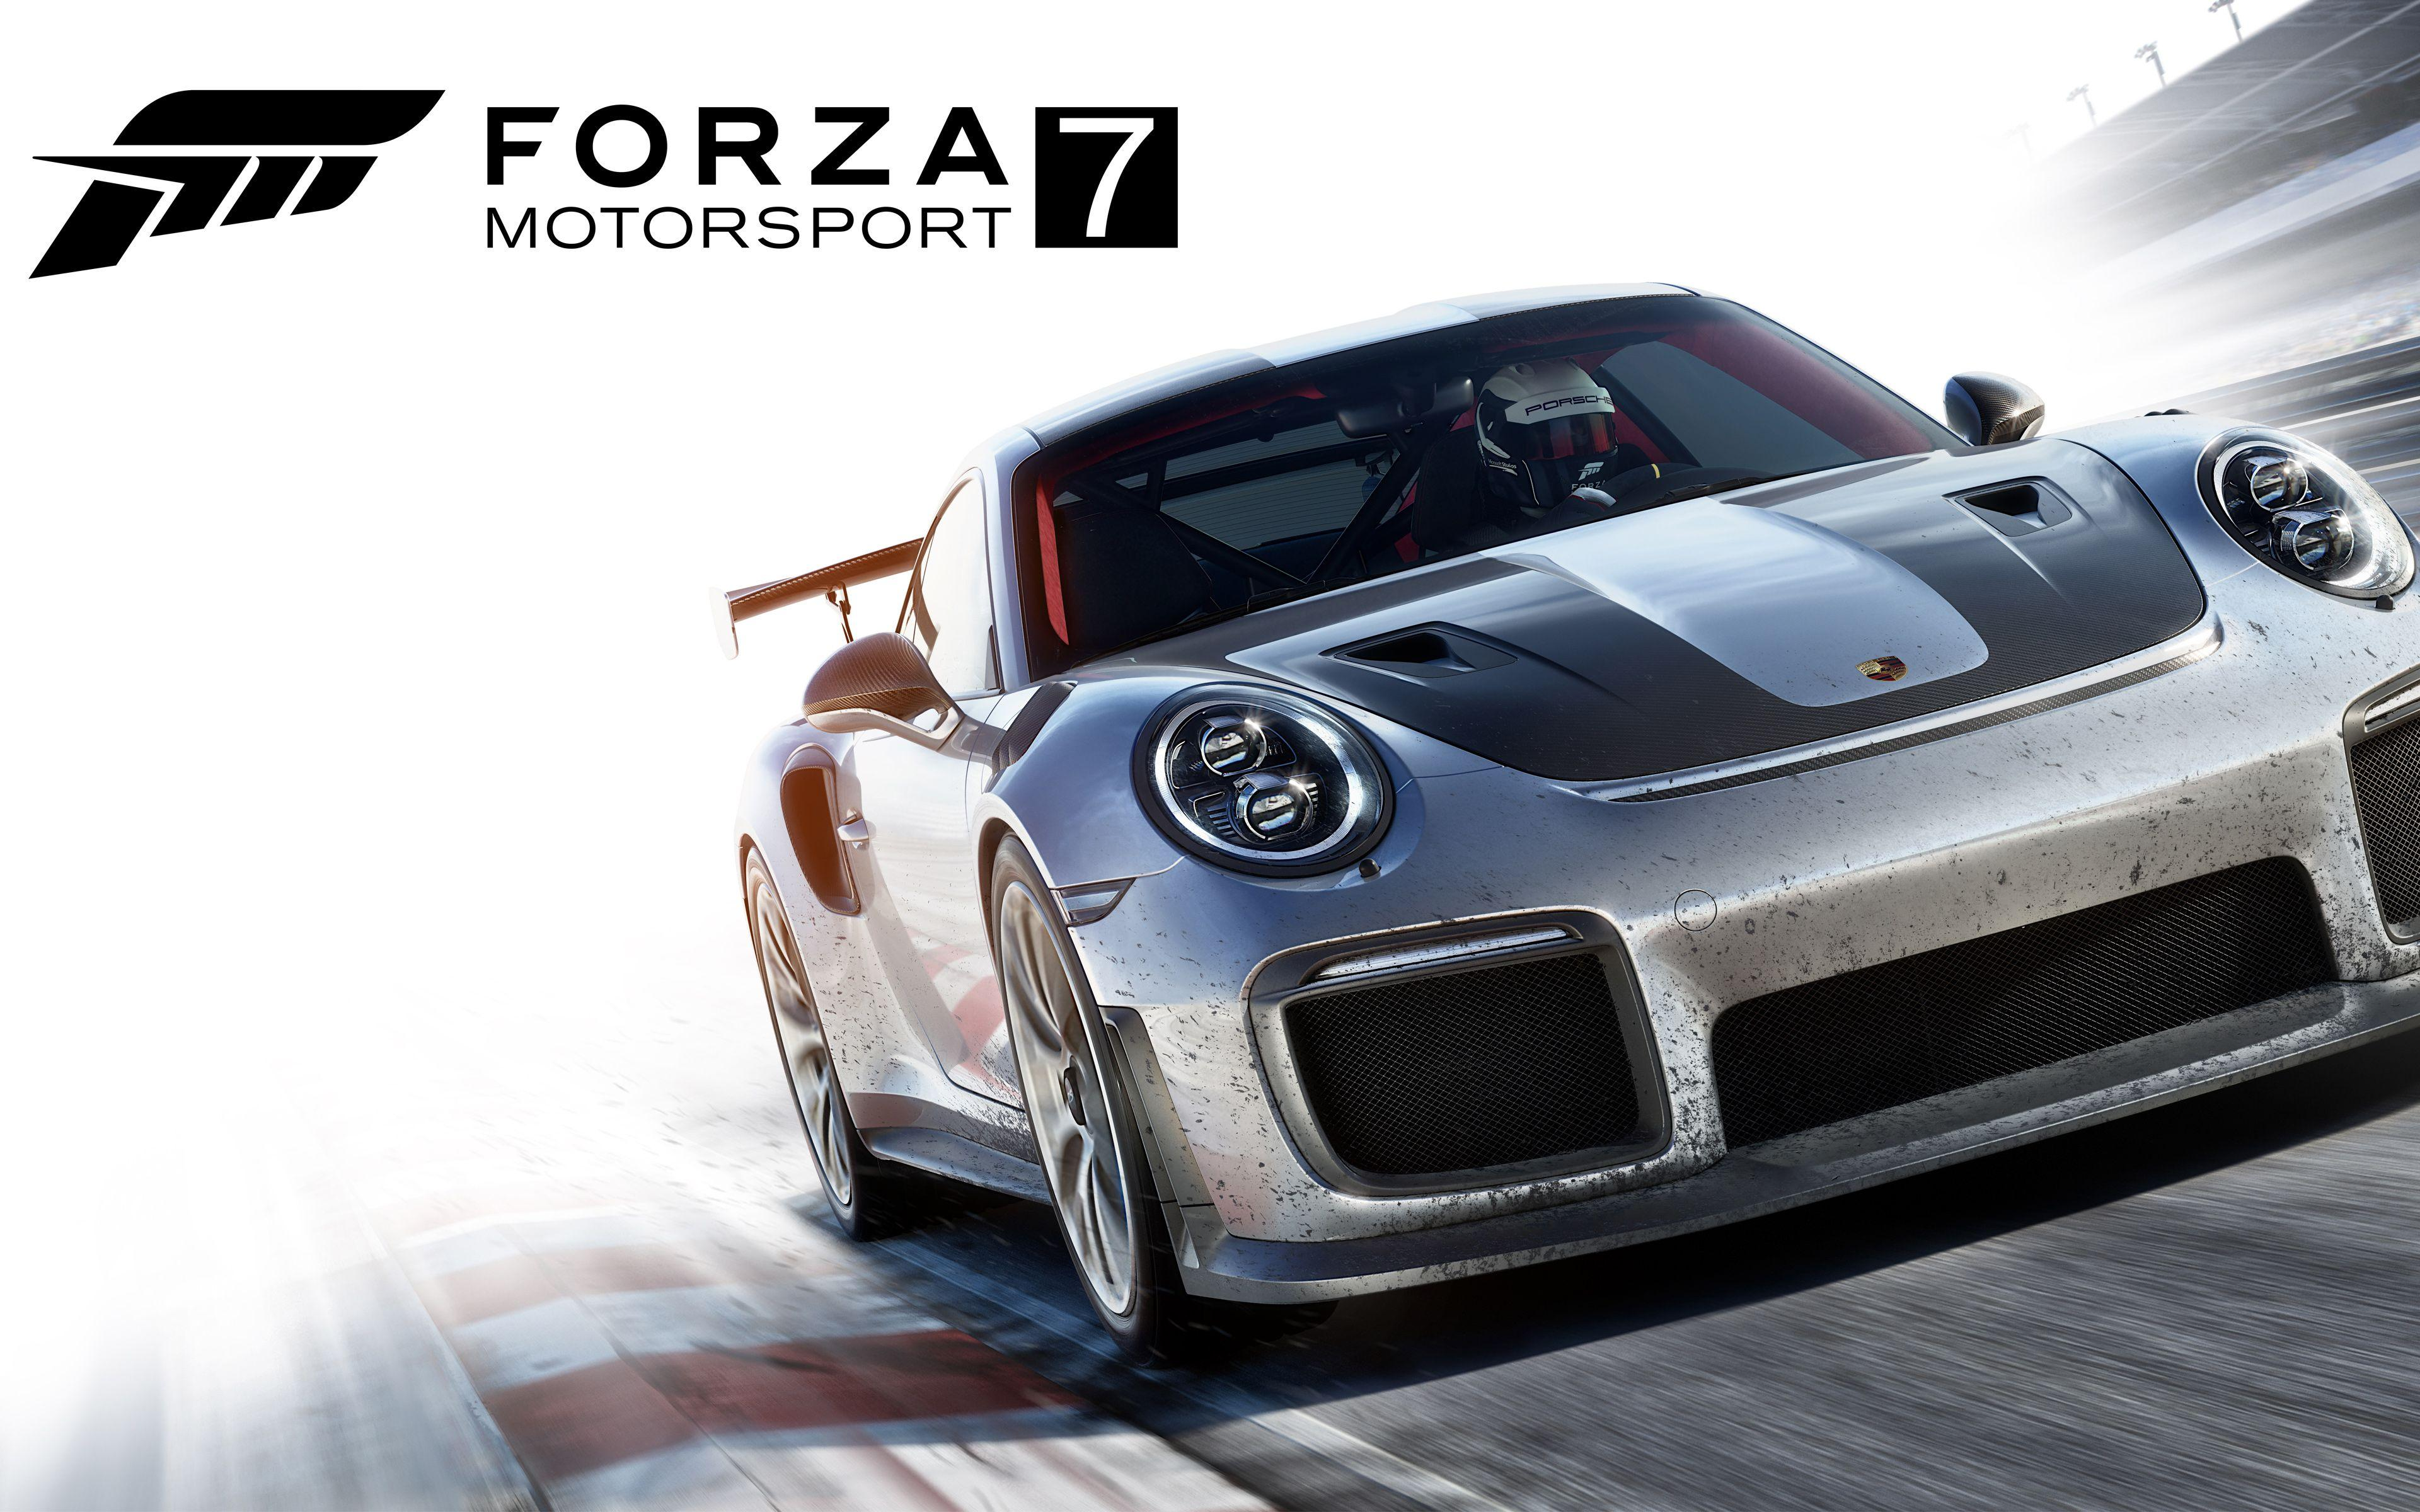 Forza Motorsport 7 Wallpapers Wallpaper Cave